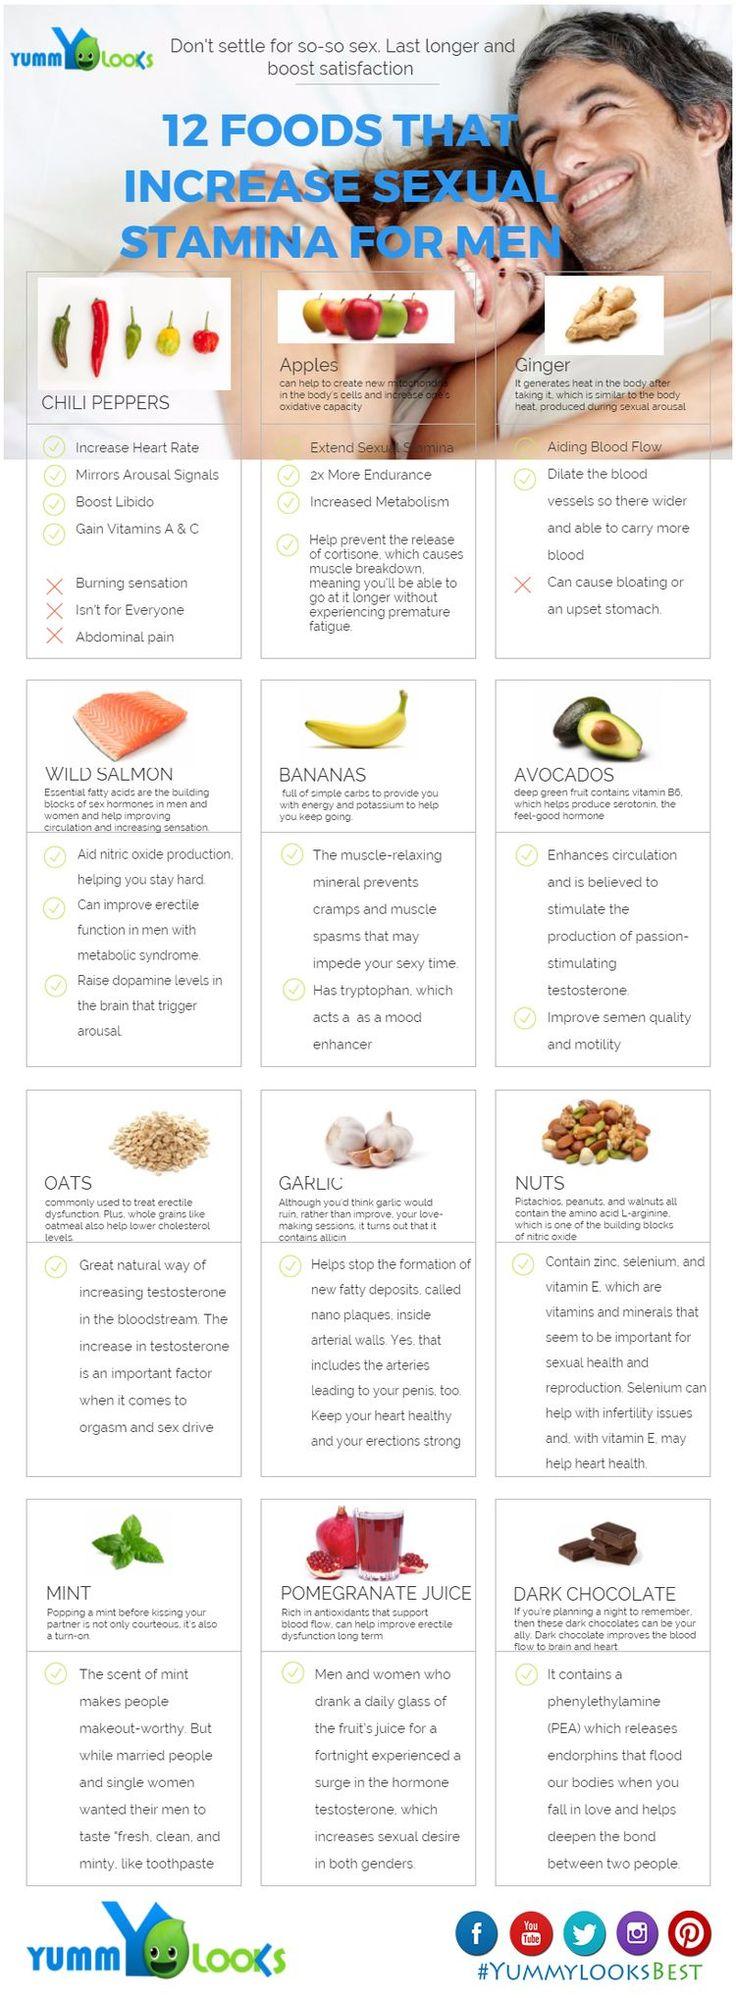 12 FOODS THAT INCREASE SEXUAL STAMINA FOR MEN #vitaminC #animals #tagforlikes